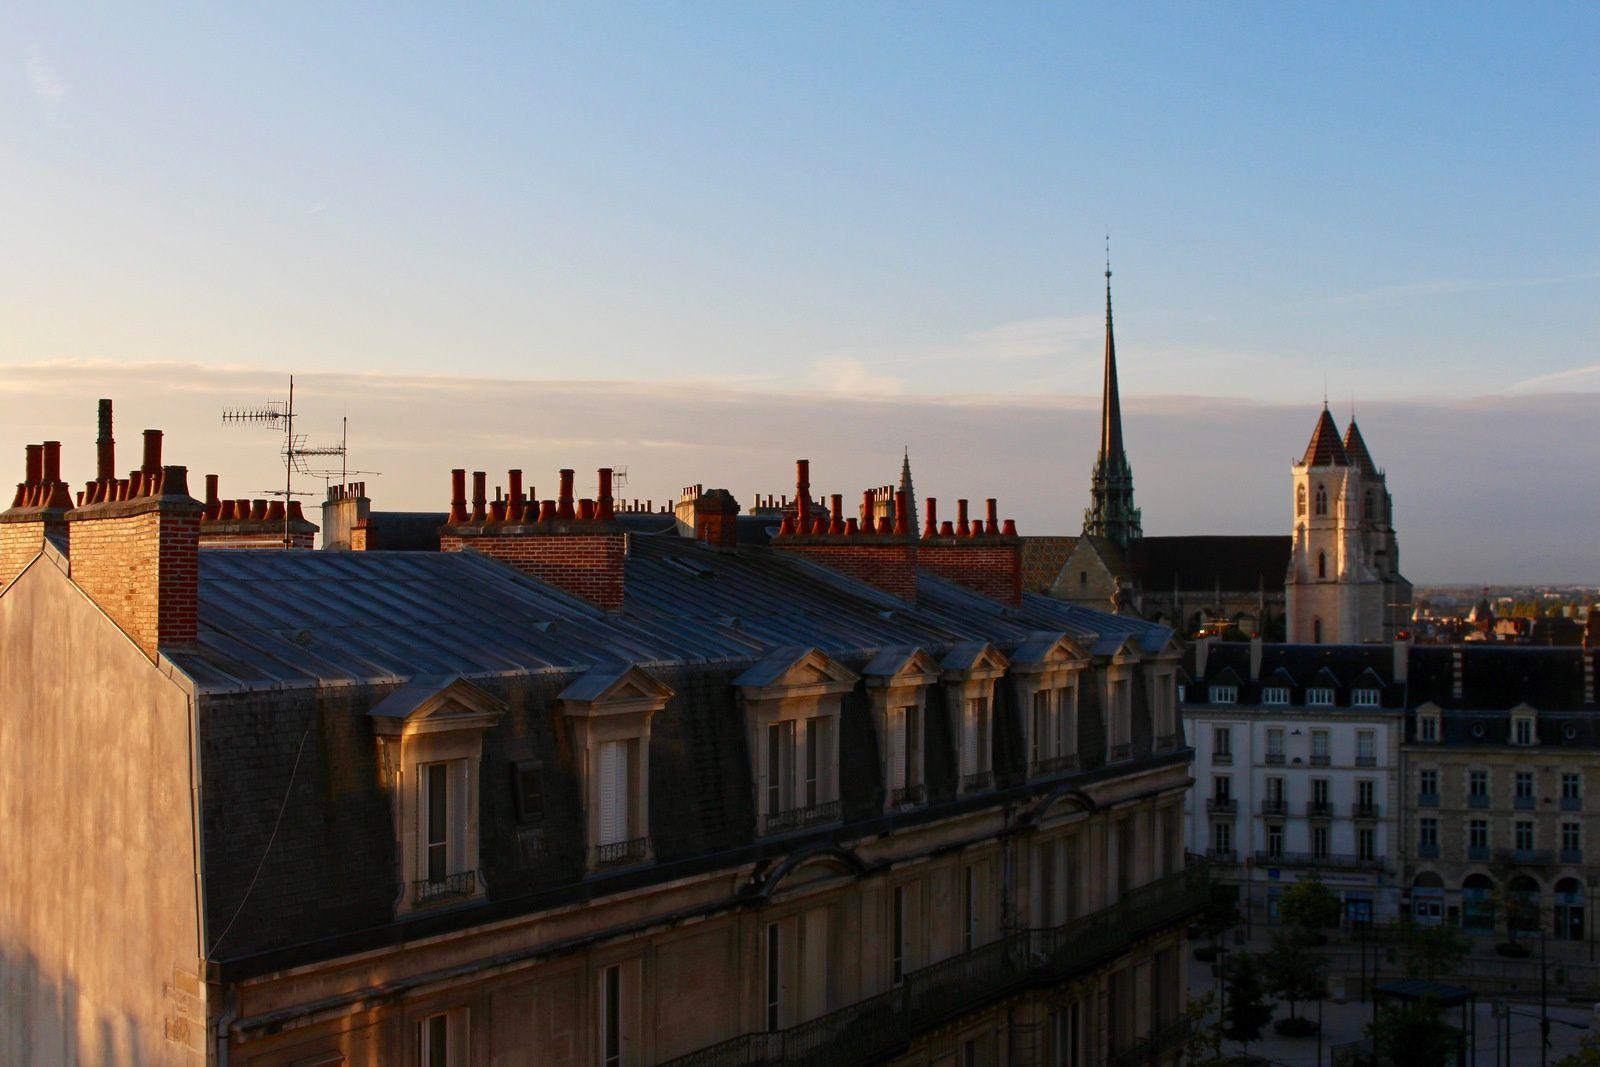 L'expérience Vertigo à Dijon